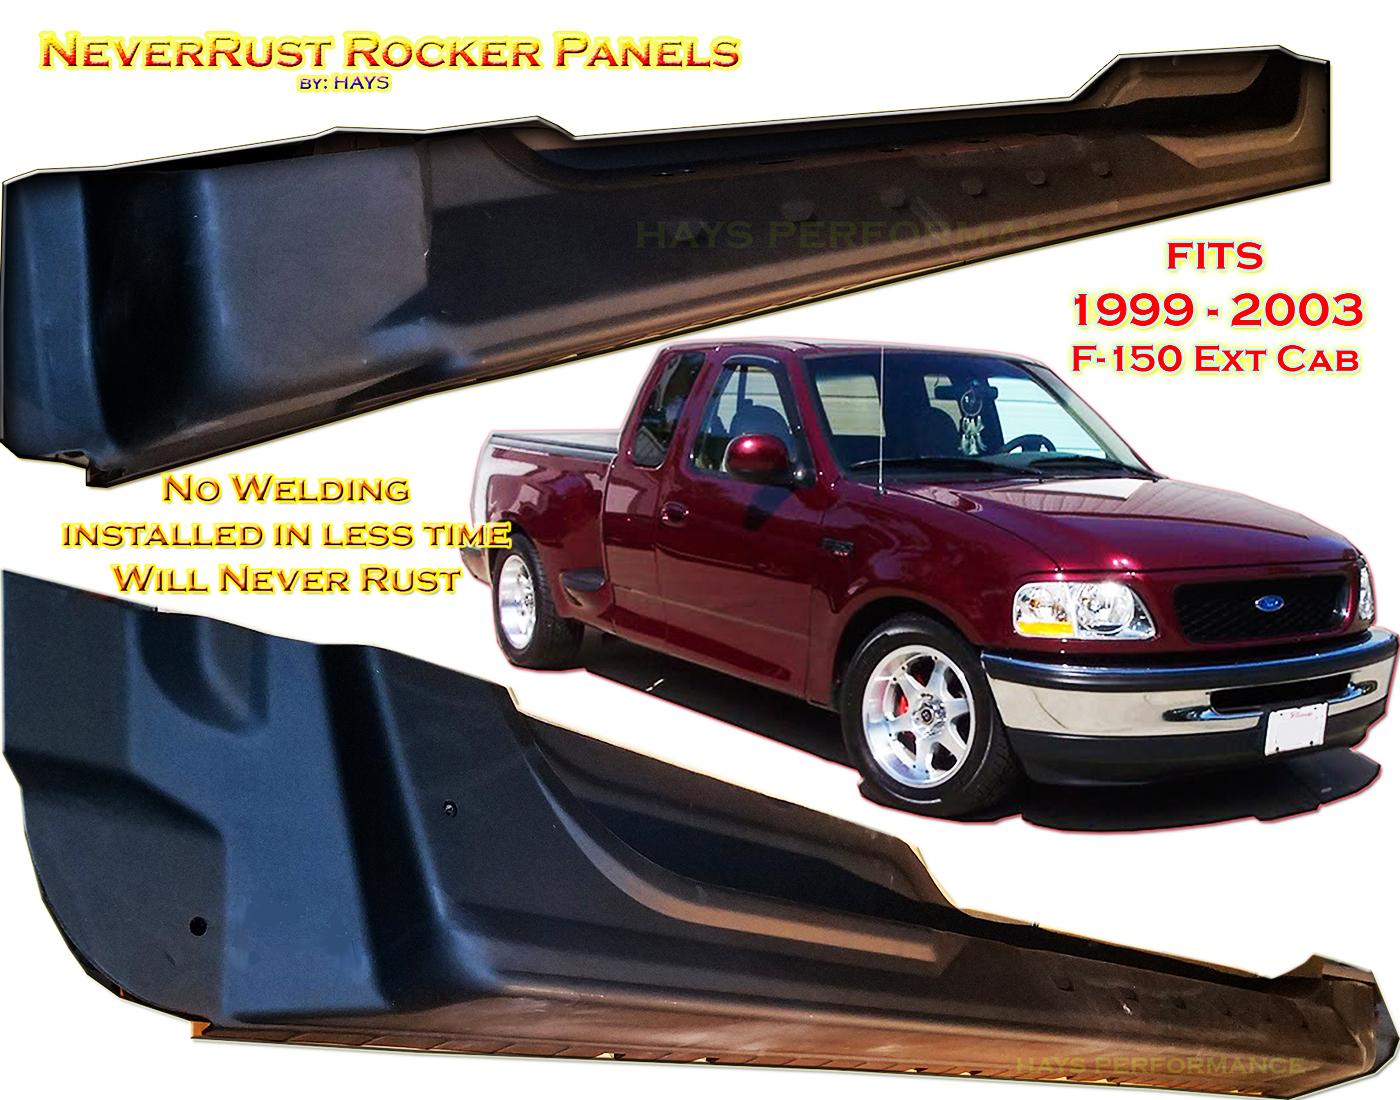 Surprising 1998 2003 Neverrust F150 Extended Cab Rocker Panel Set Pabps2019 Chair Design Images Pabps2019Com